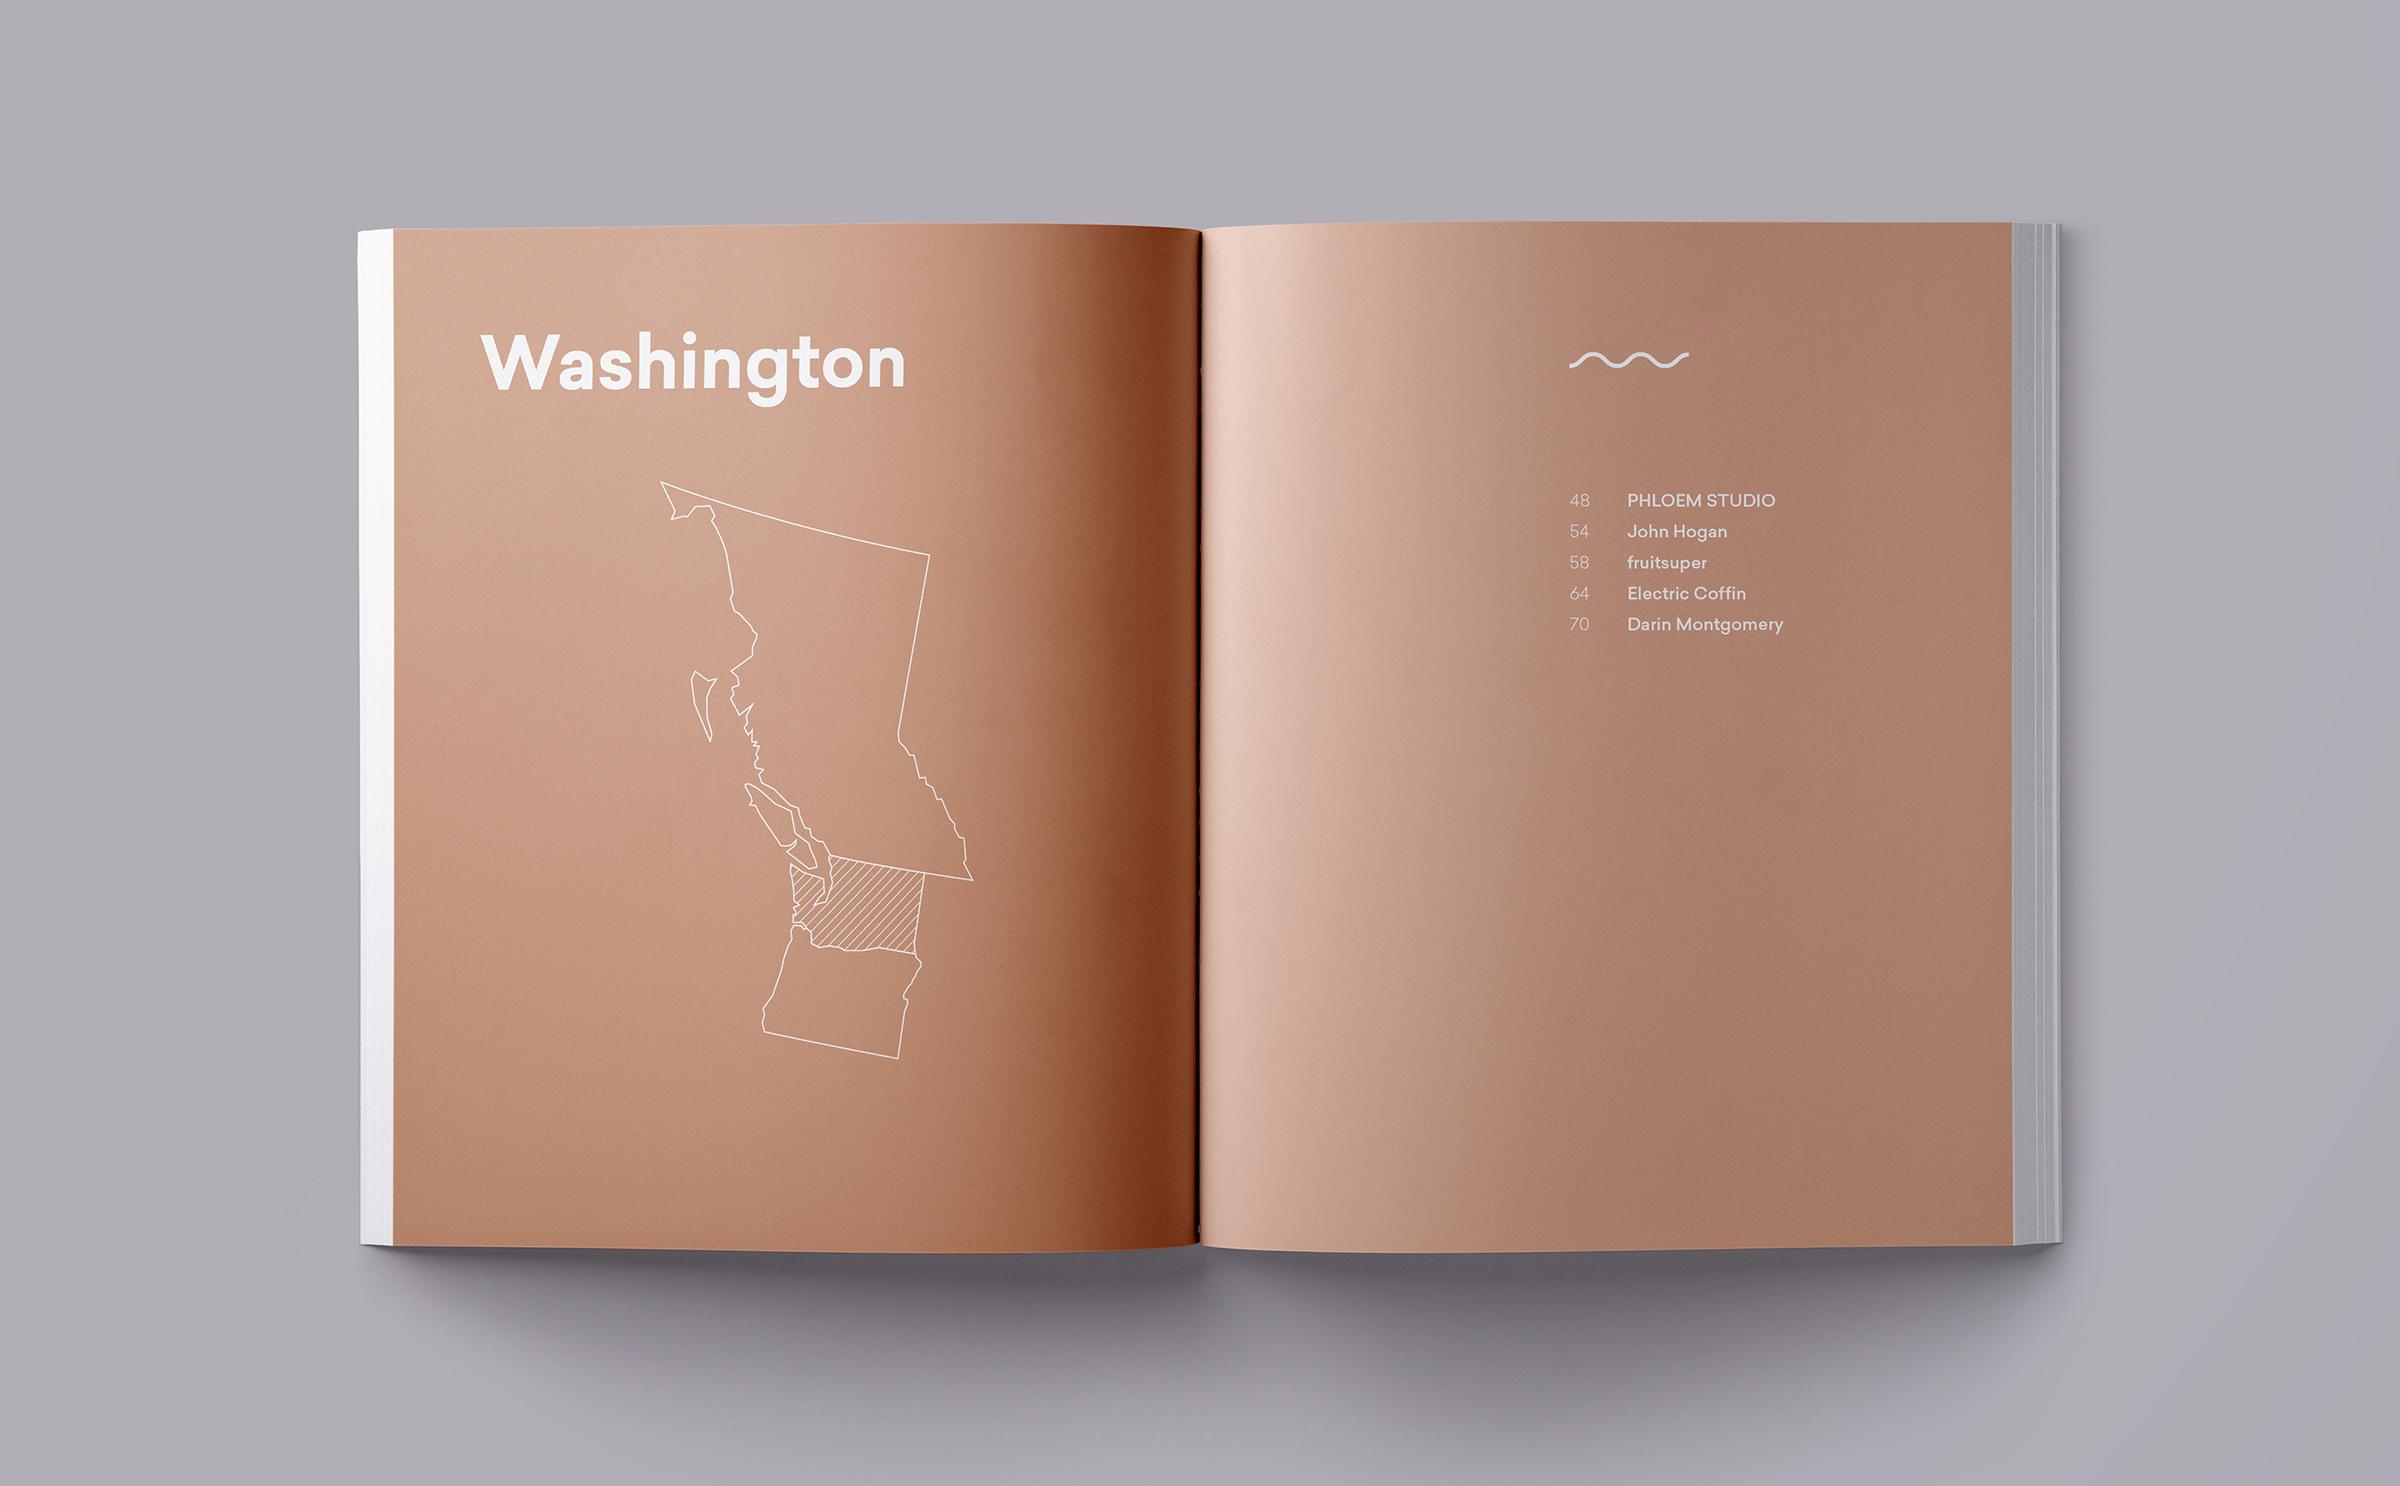 Currents_Pacific-Northwest-Design_IDS_book_daniel-zachrisson_section.jpg